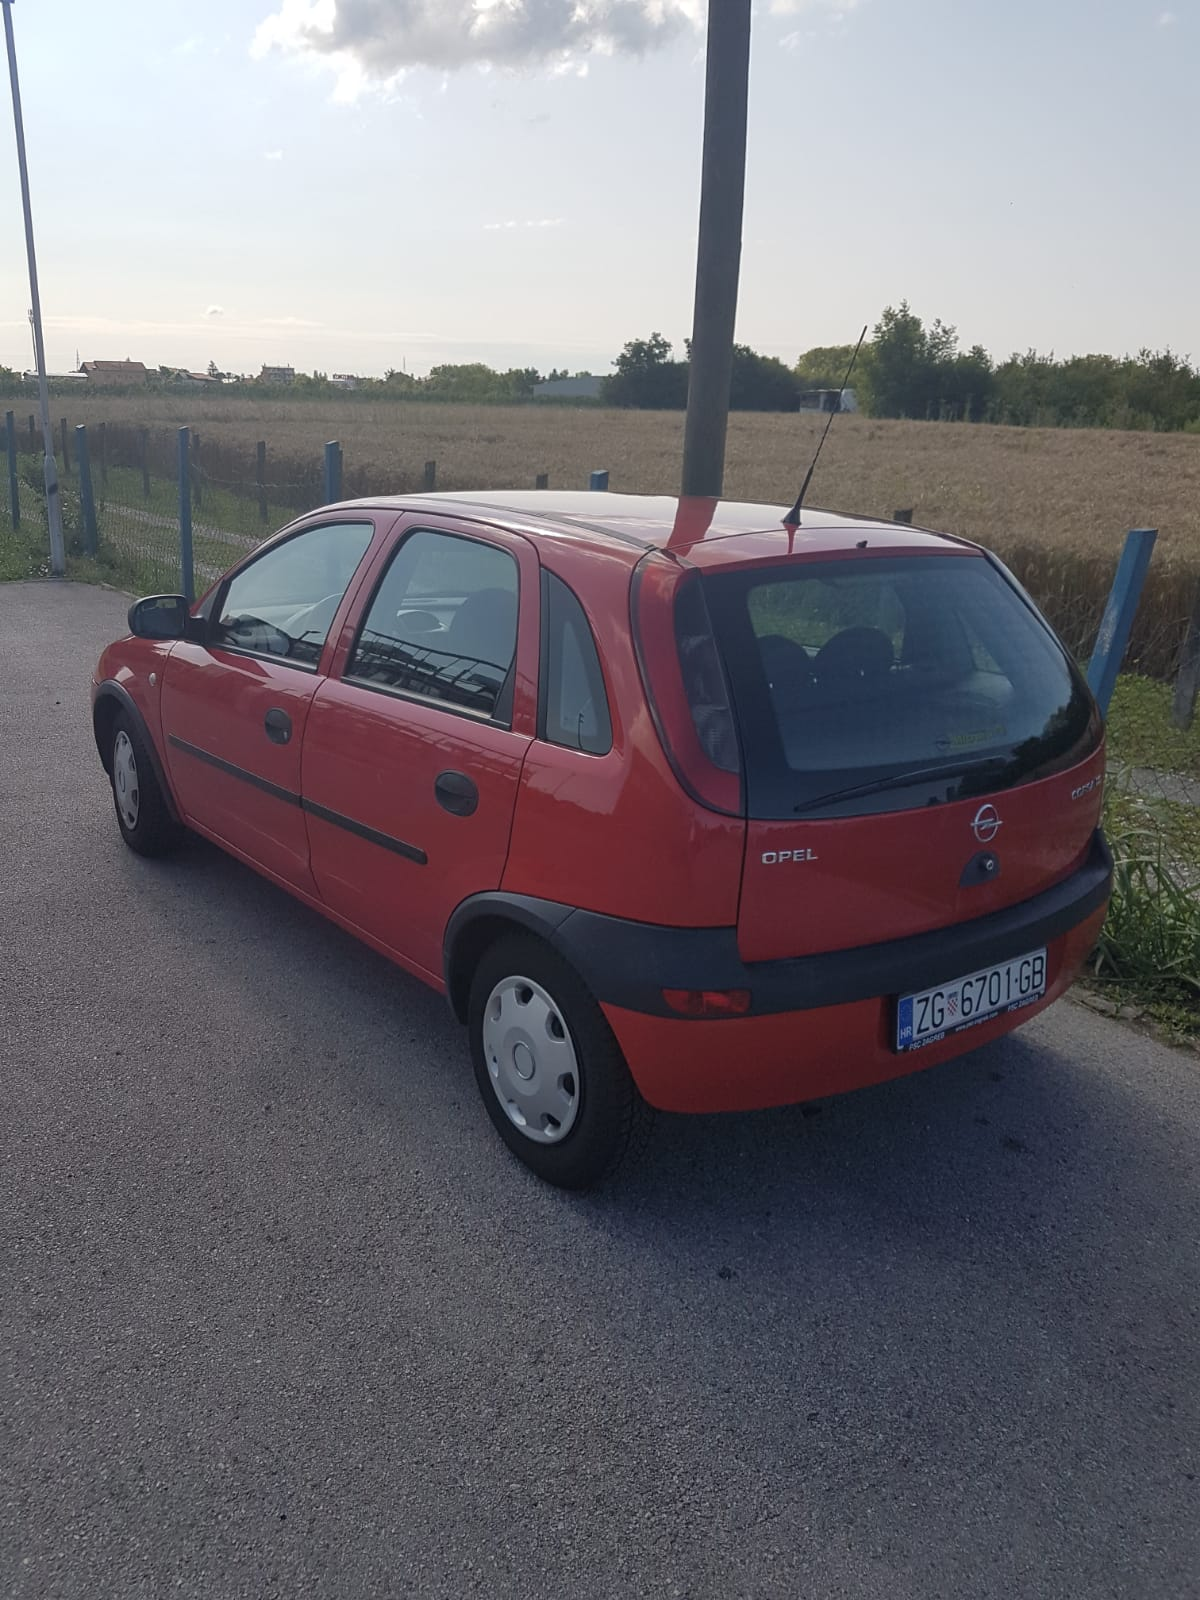 Opel Corsa 1.2 16v,2002.,171400km